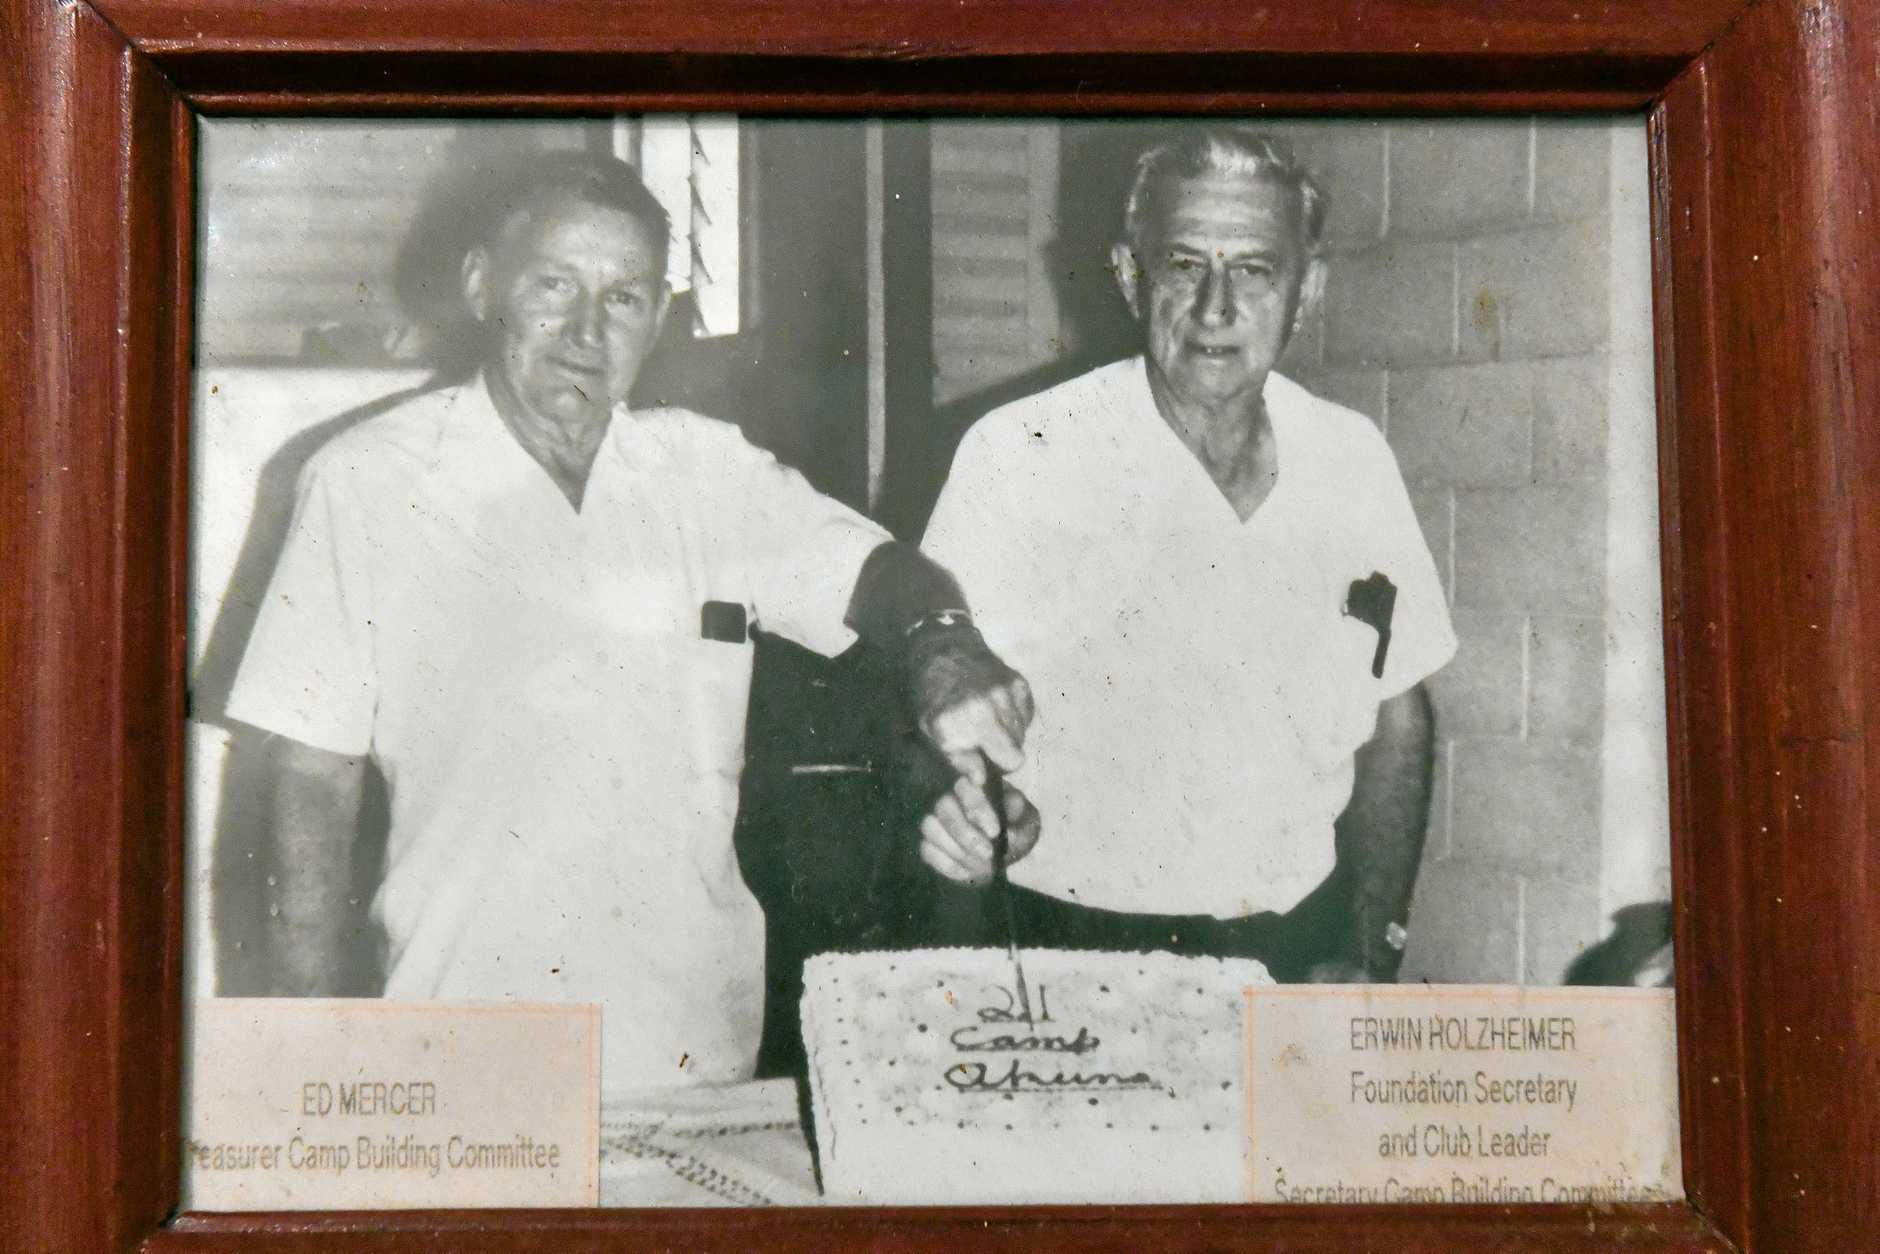 Ed Mercer and Erwin Holzheimer at Camp Akuna.